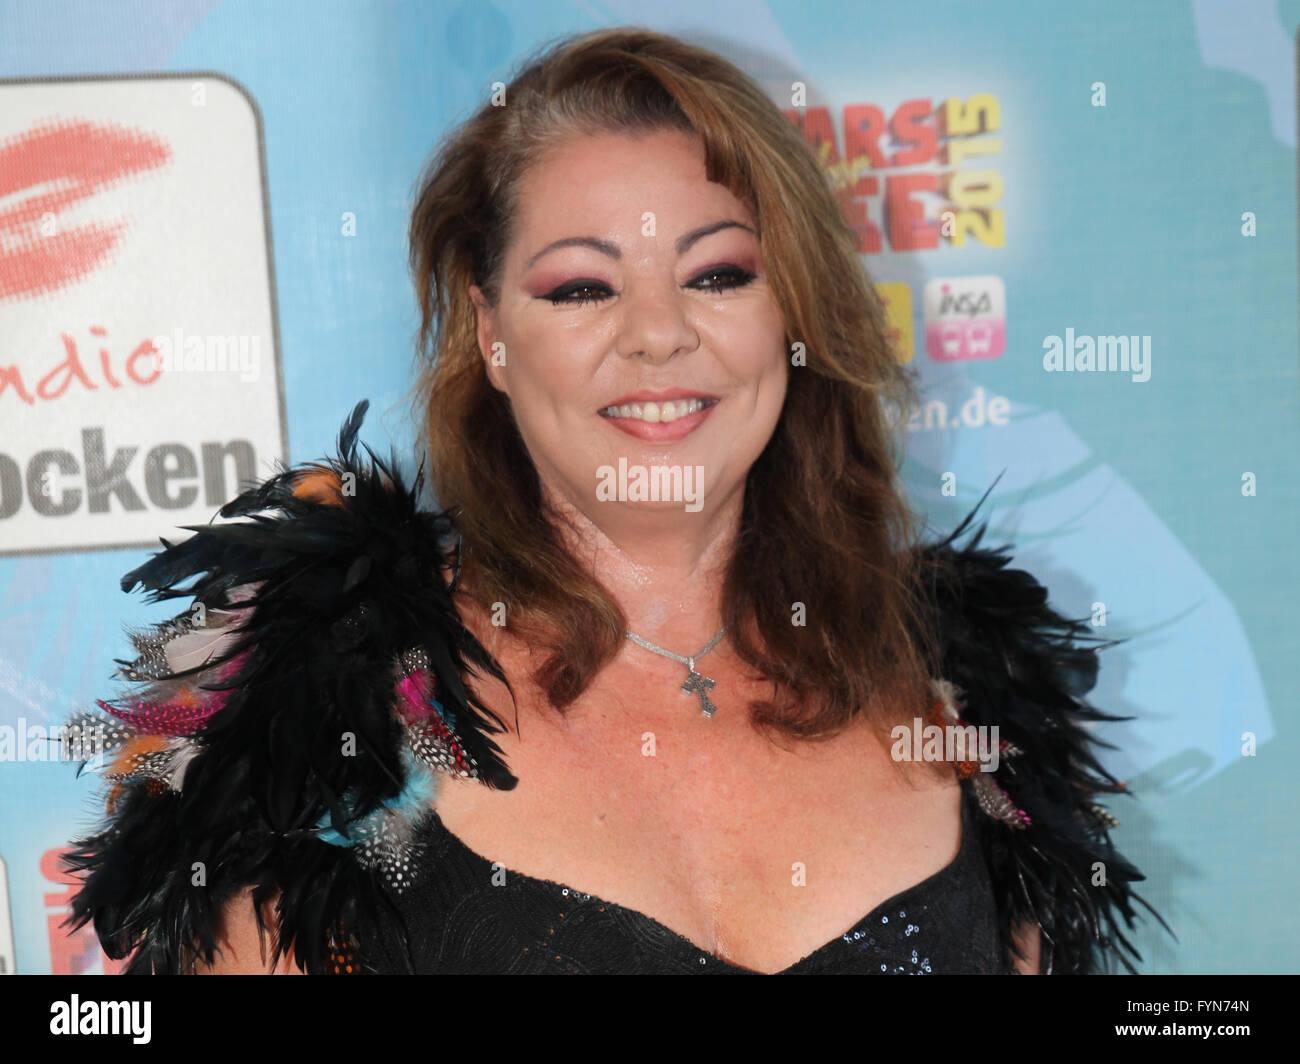 Sängerin Sandra